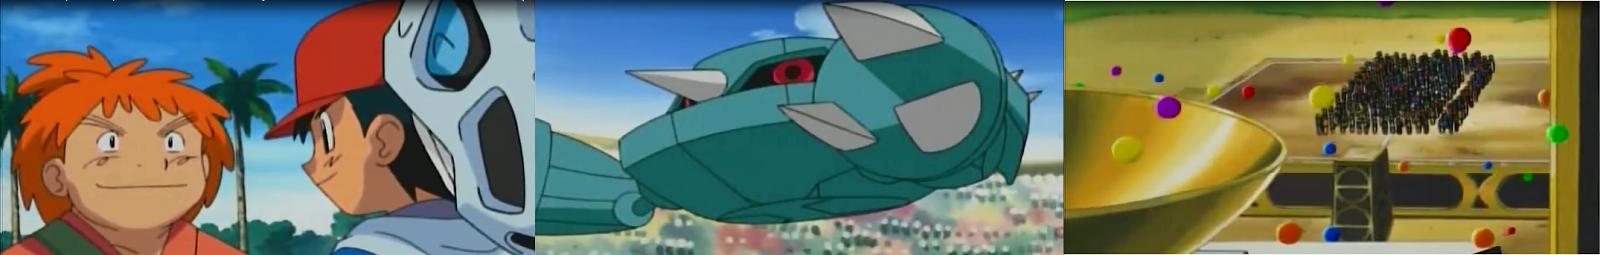 Pokemon Capitulo 33 Temporada 8 Salvados Por Un Beldum